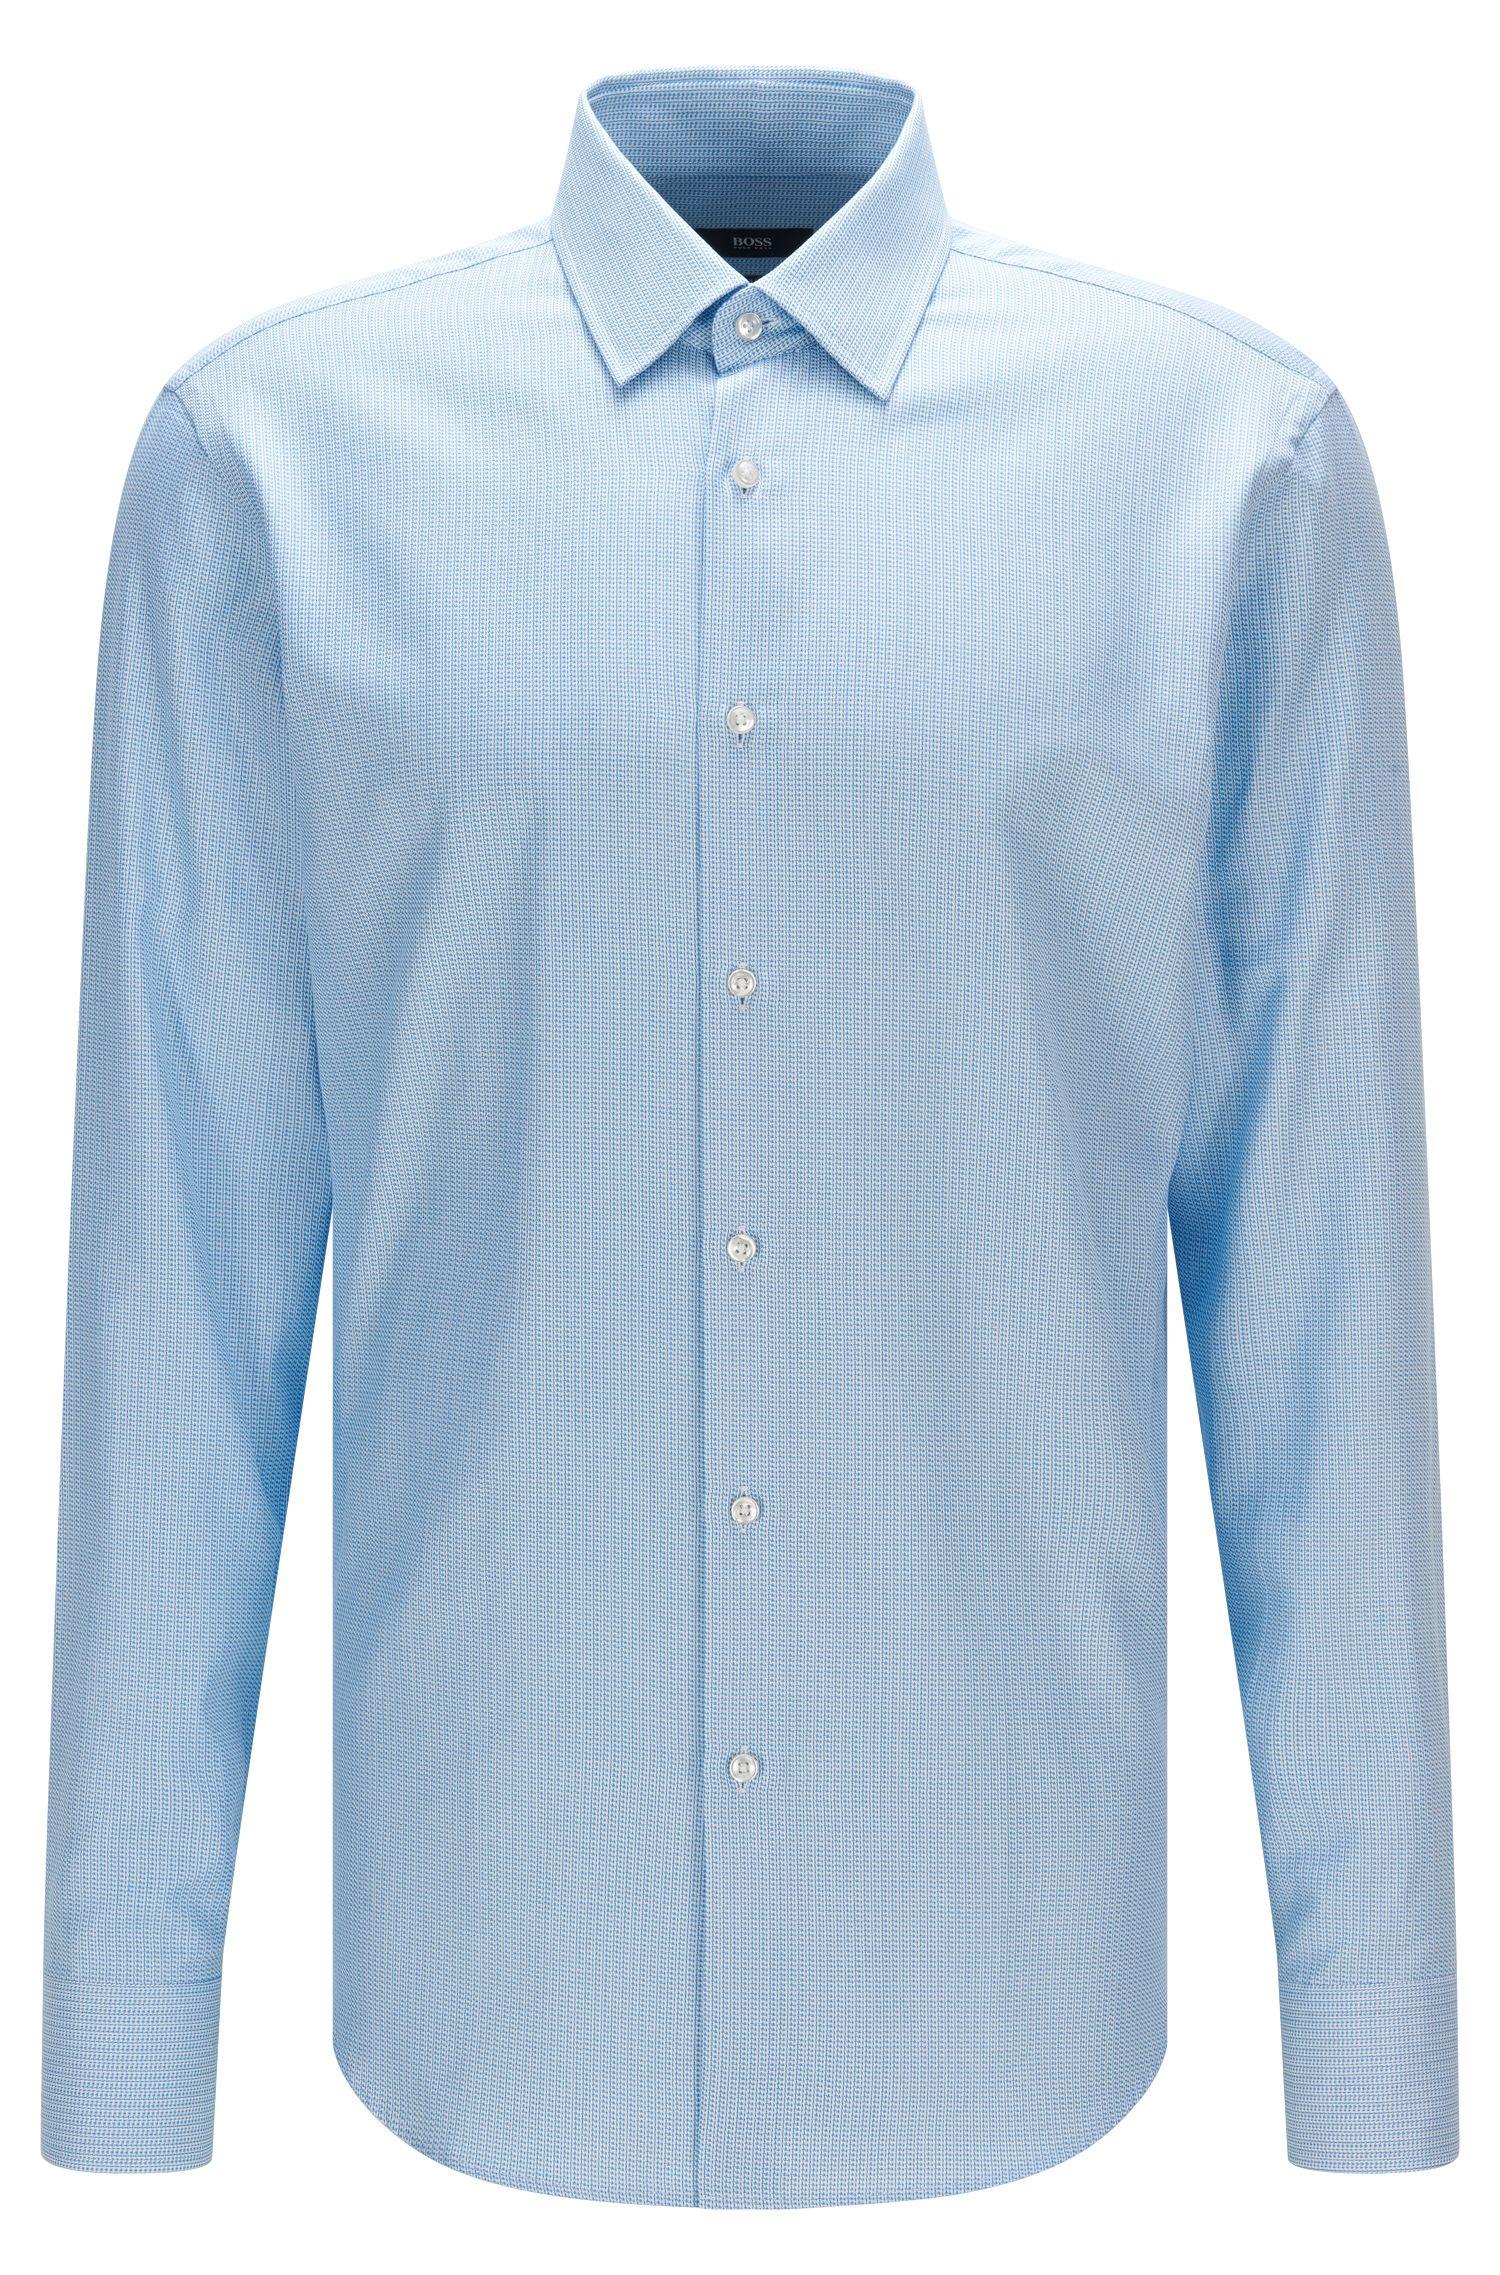 Dobby Italian Cotton Dress Shirt, Regular fit   Enzo